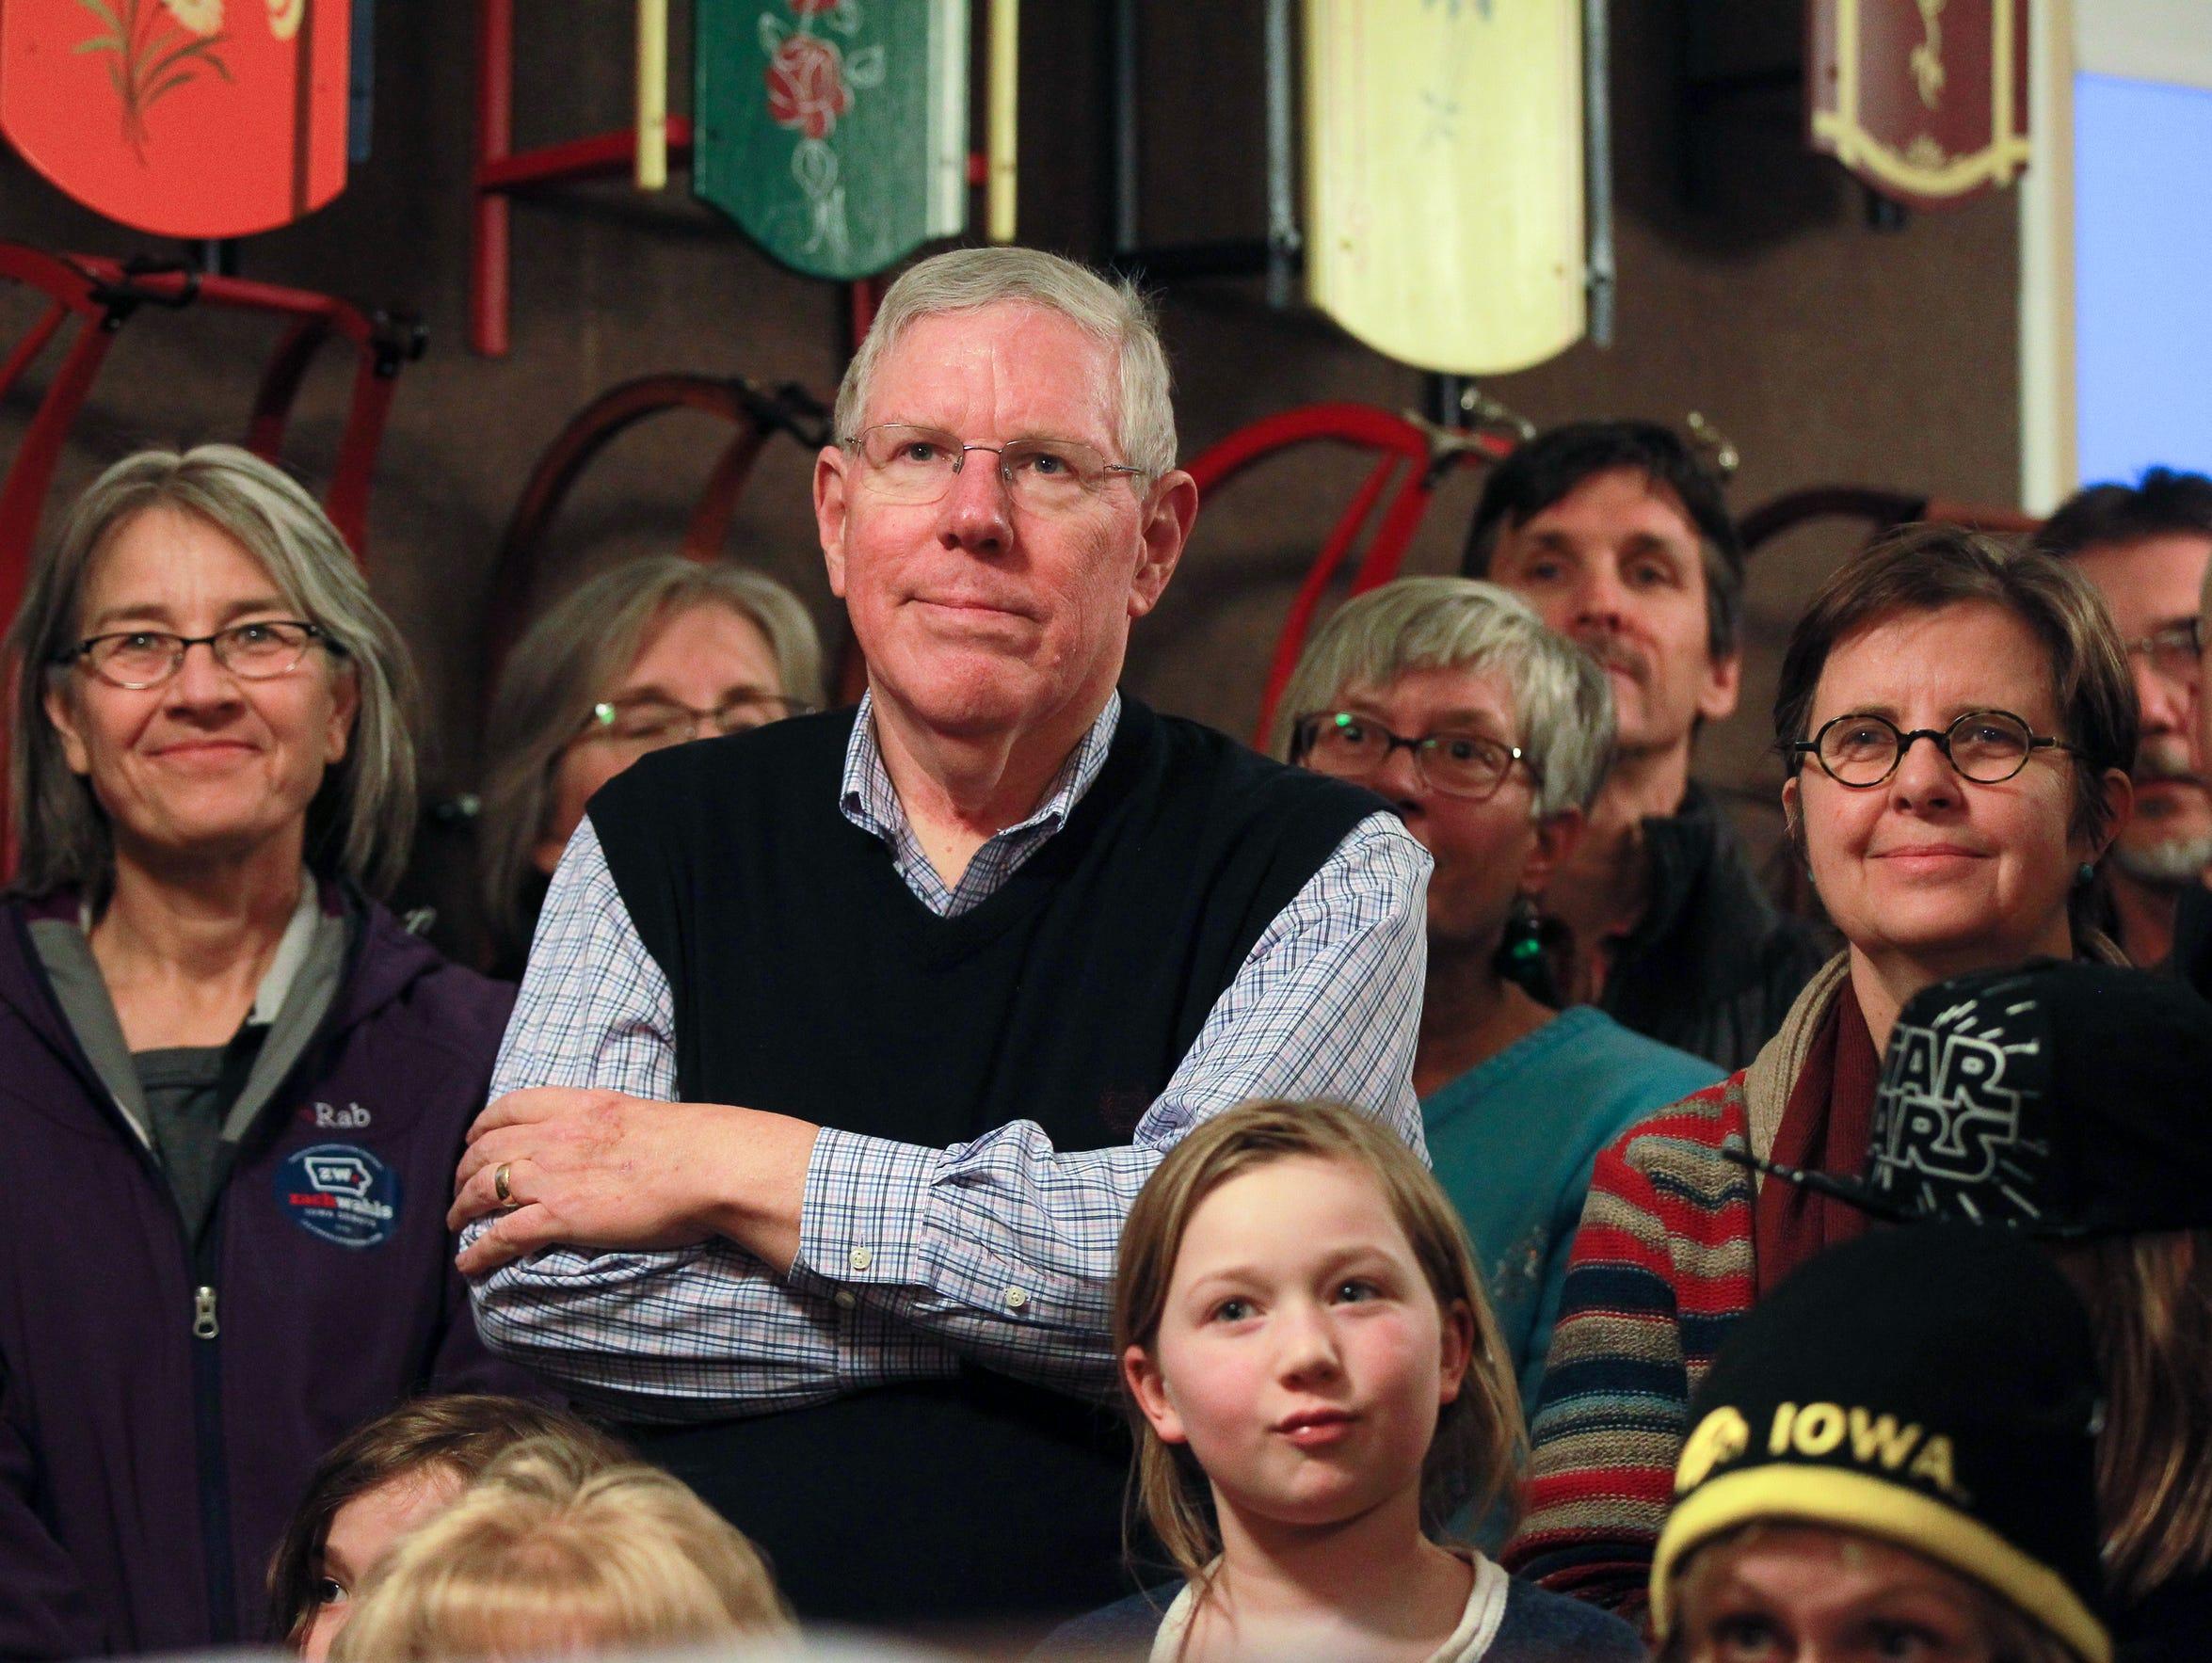 Iowa Sen. Bob Dvorsky (D-Coralville) listens to Zach